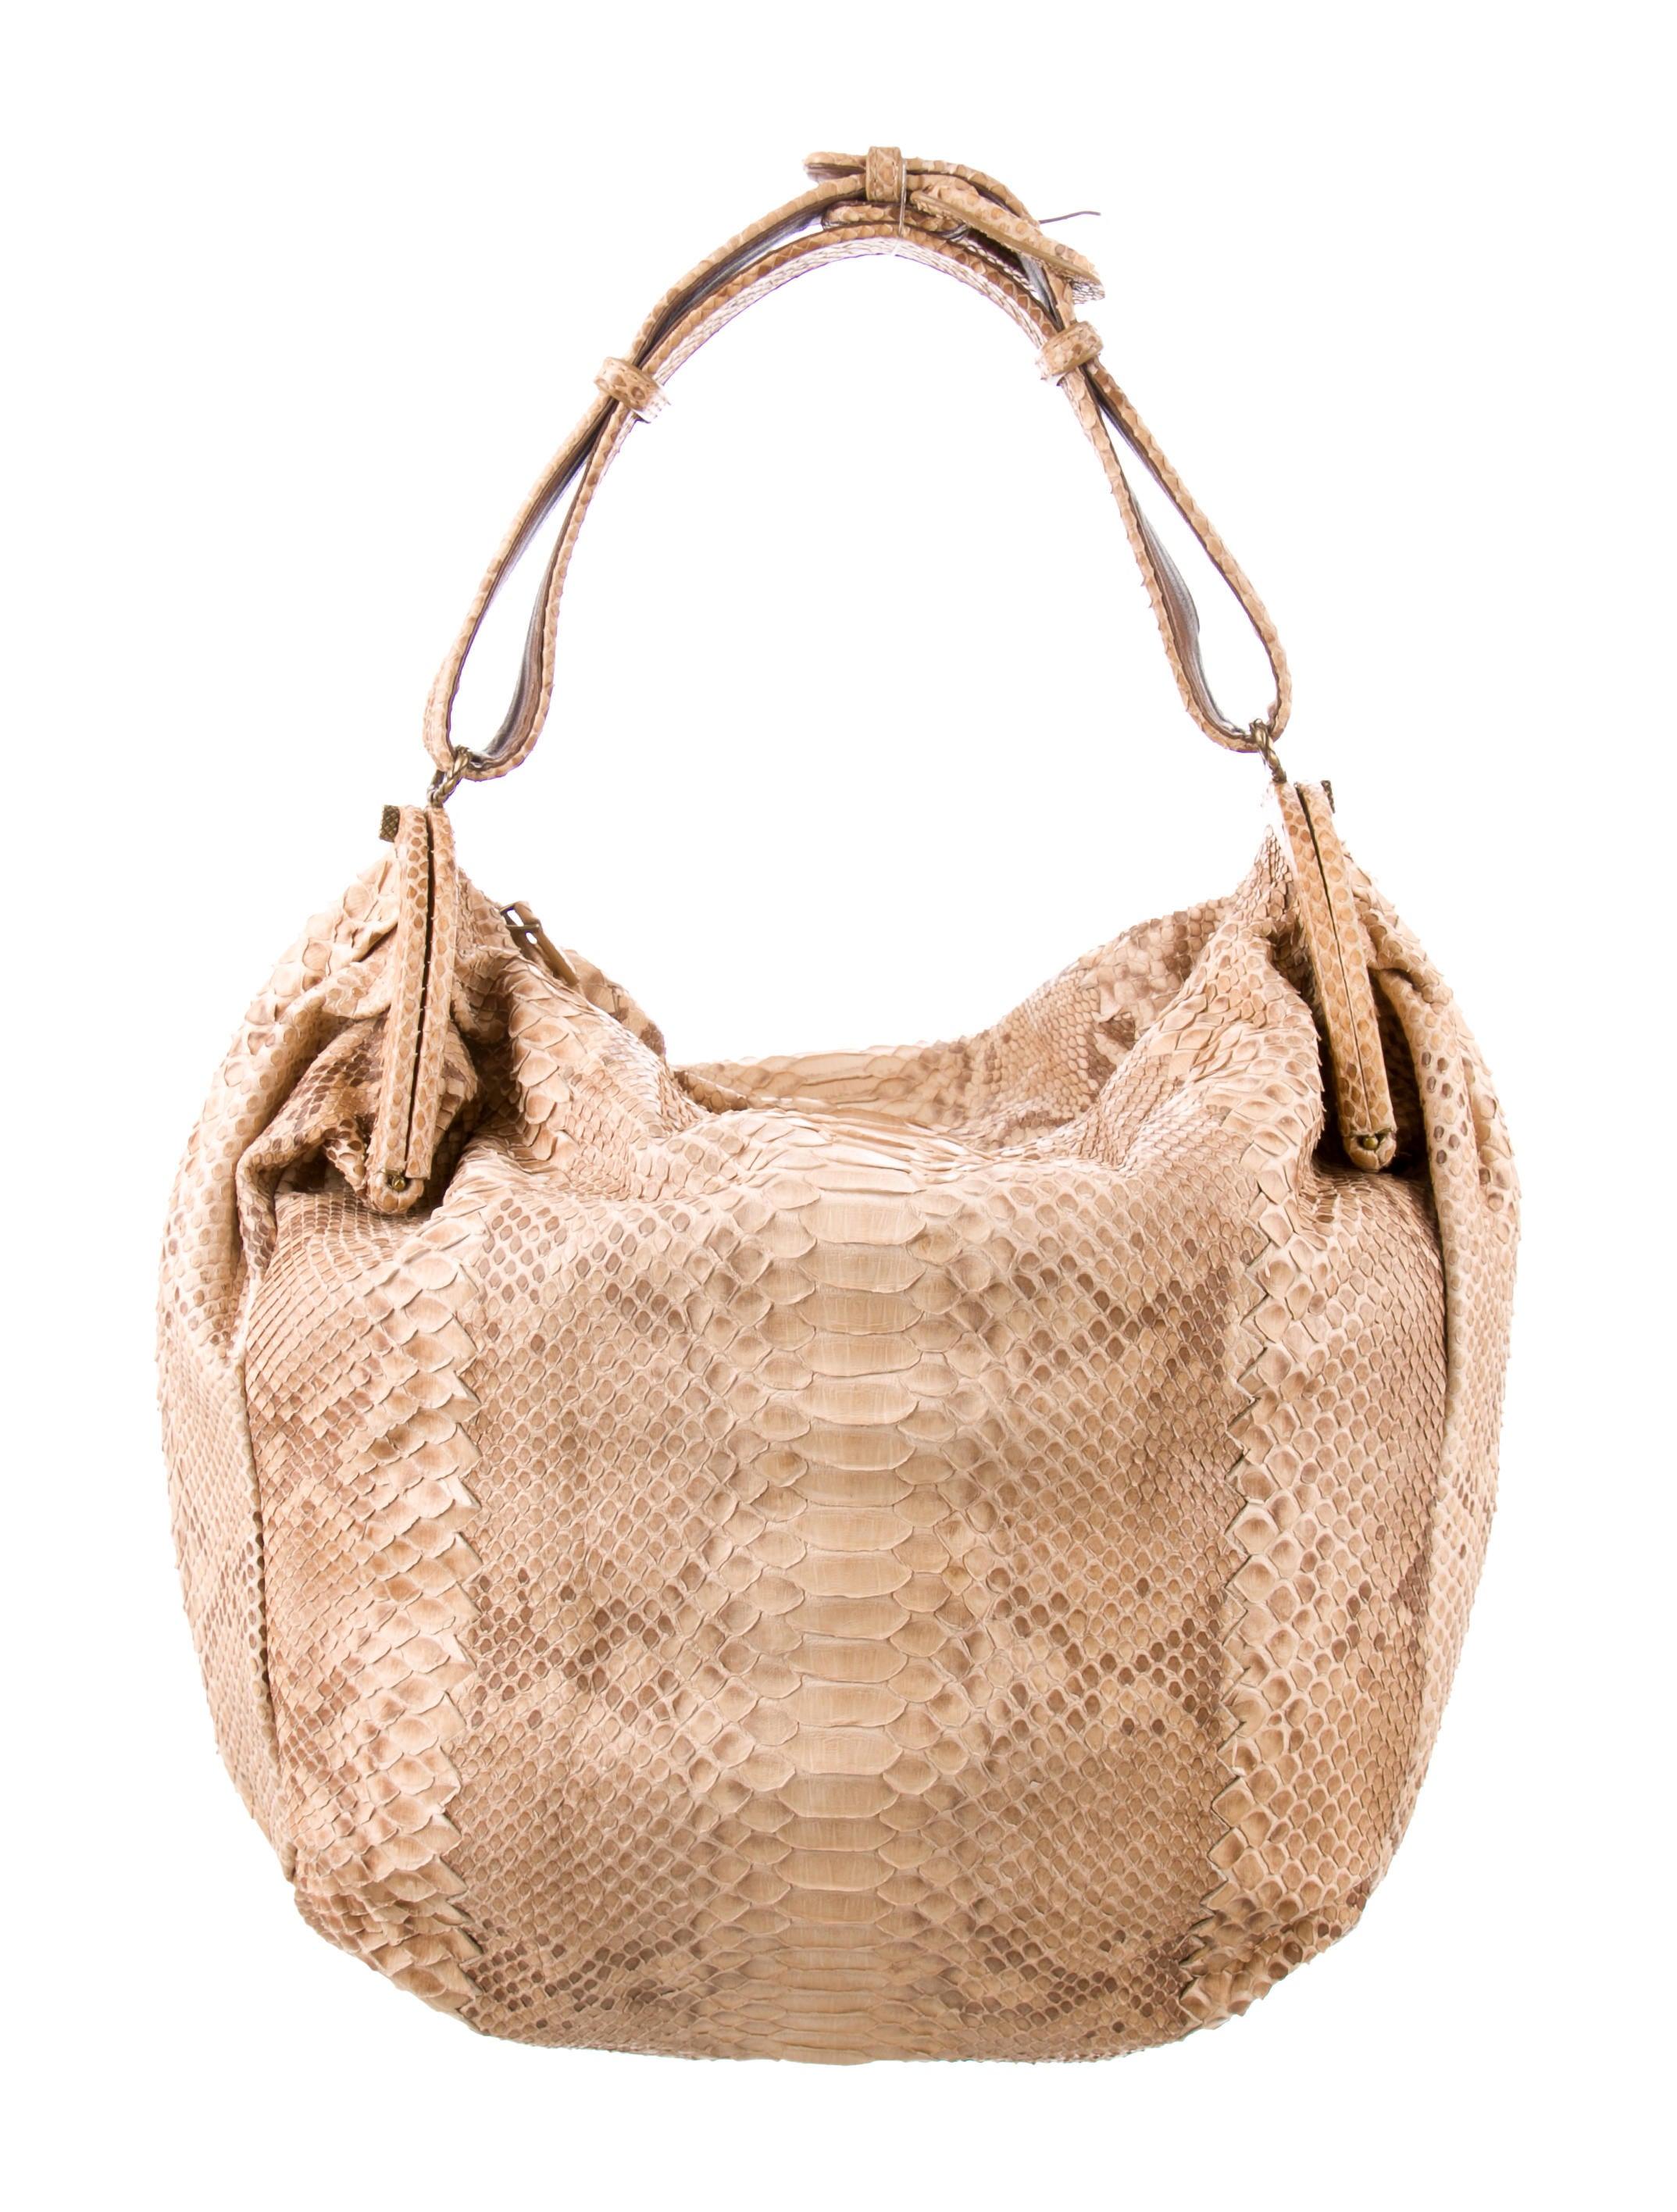 51ada987fa Bottega Veneta Duette Python Bag - Handbags - BOT58600